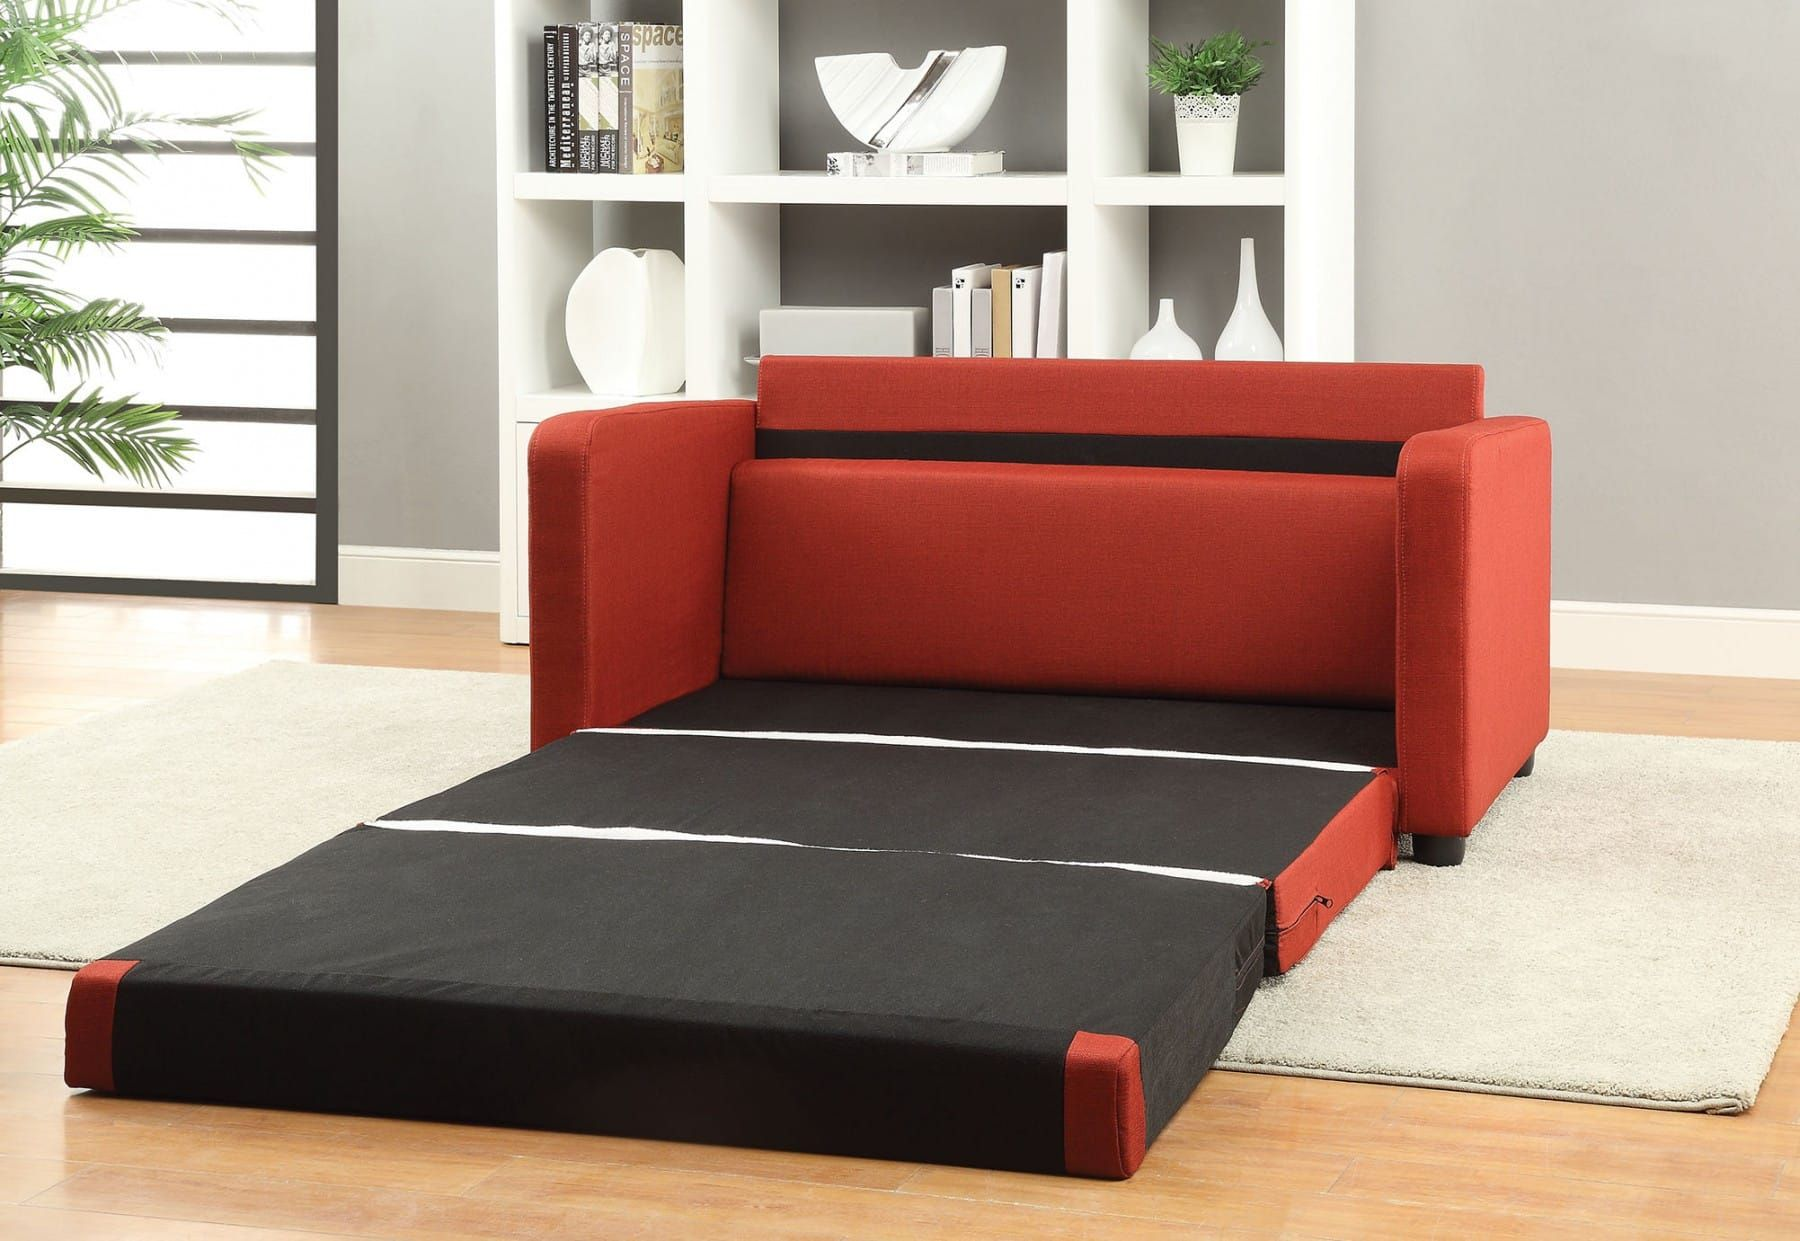 Red Sofa Bed Home Interior Design Ideas in 2020